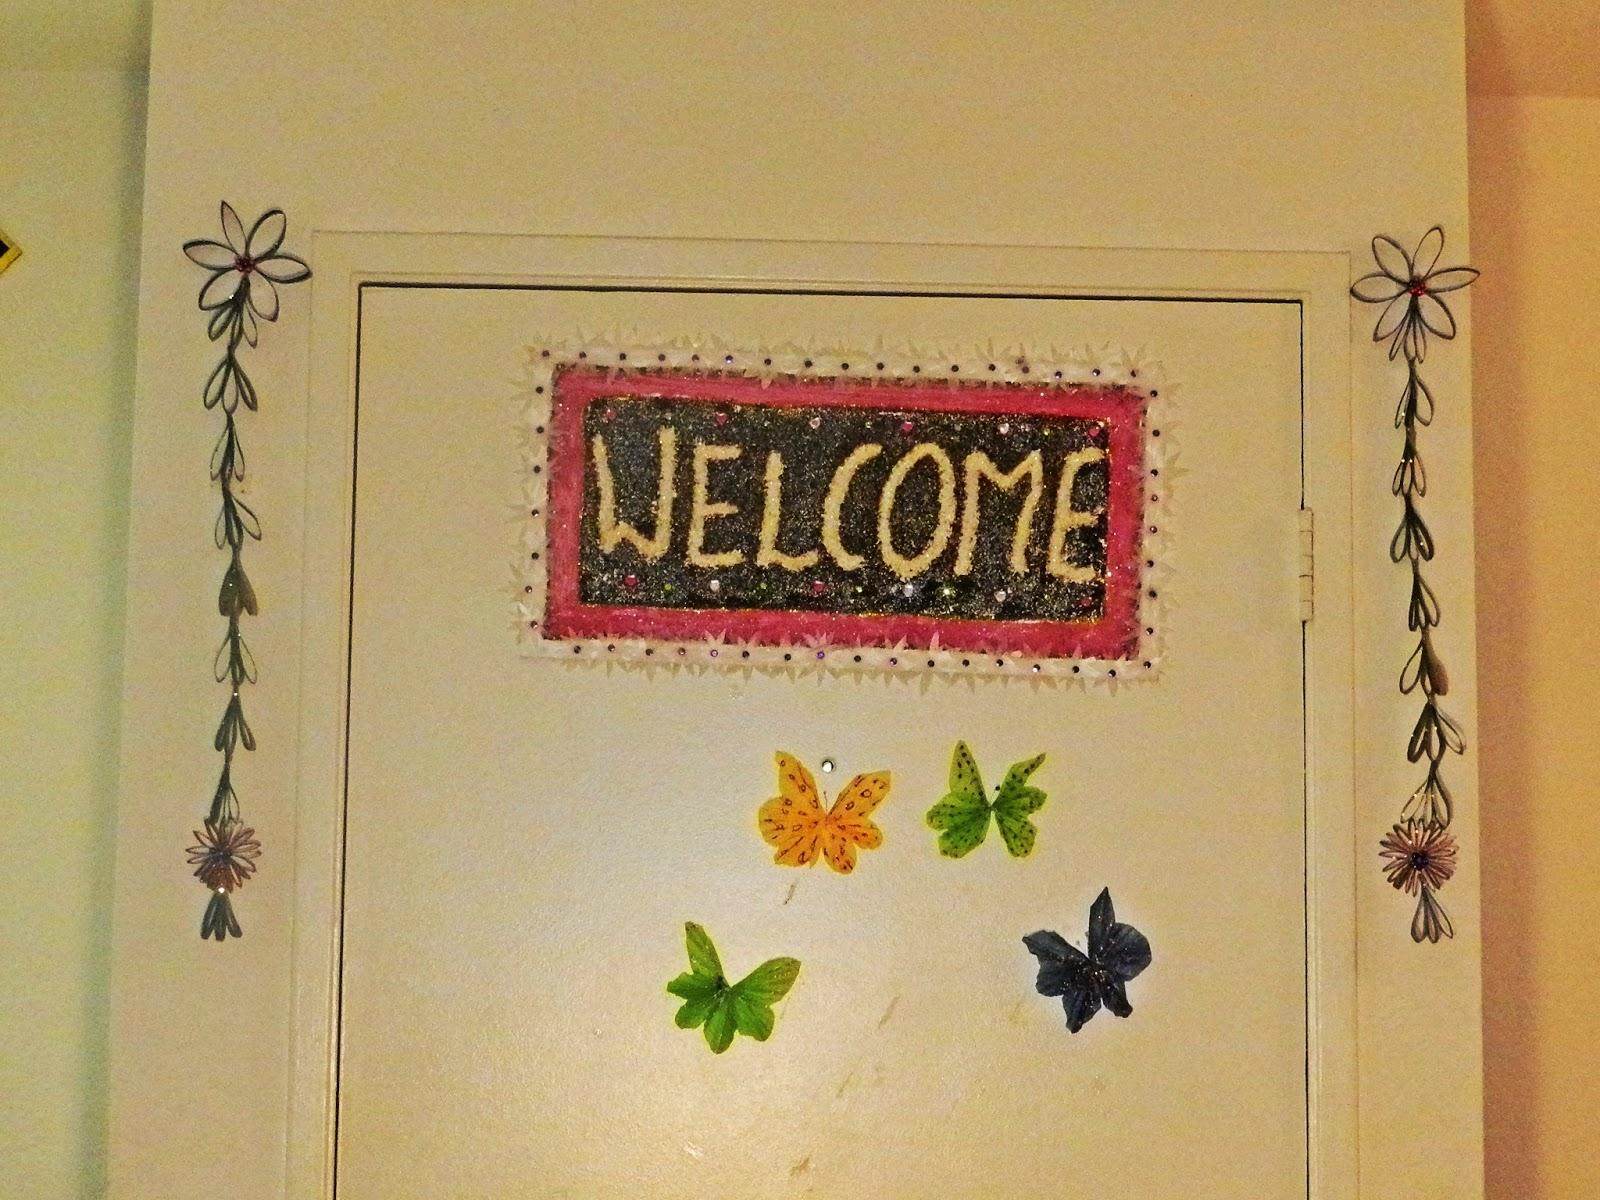 Creative DIY crafts: wall hanging